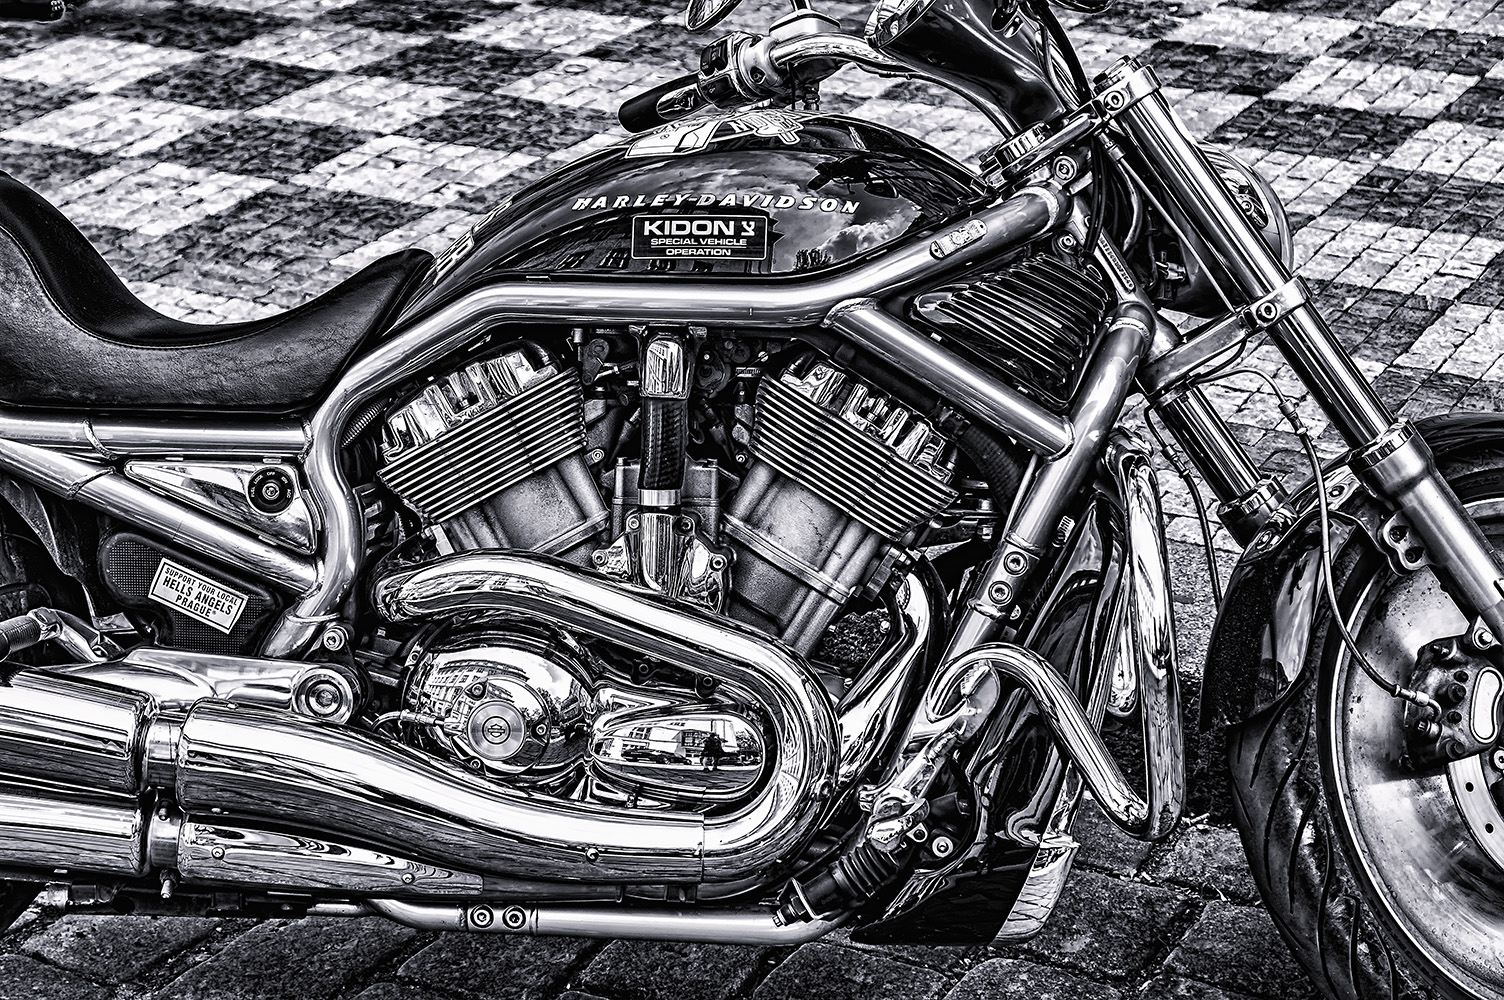 motorka harley davidson od Jan Stojan Photography ©